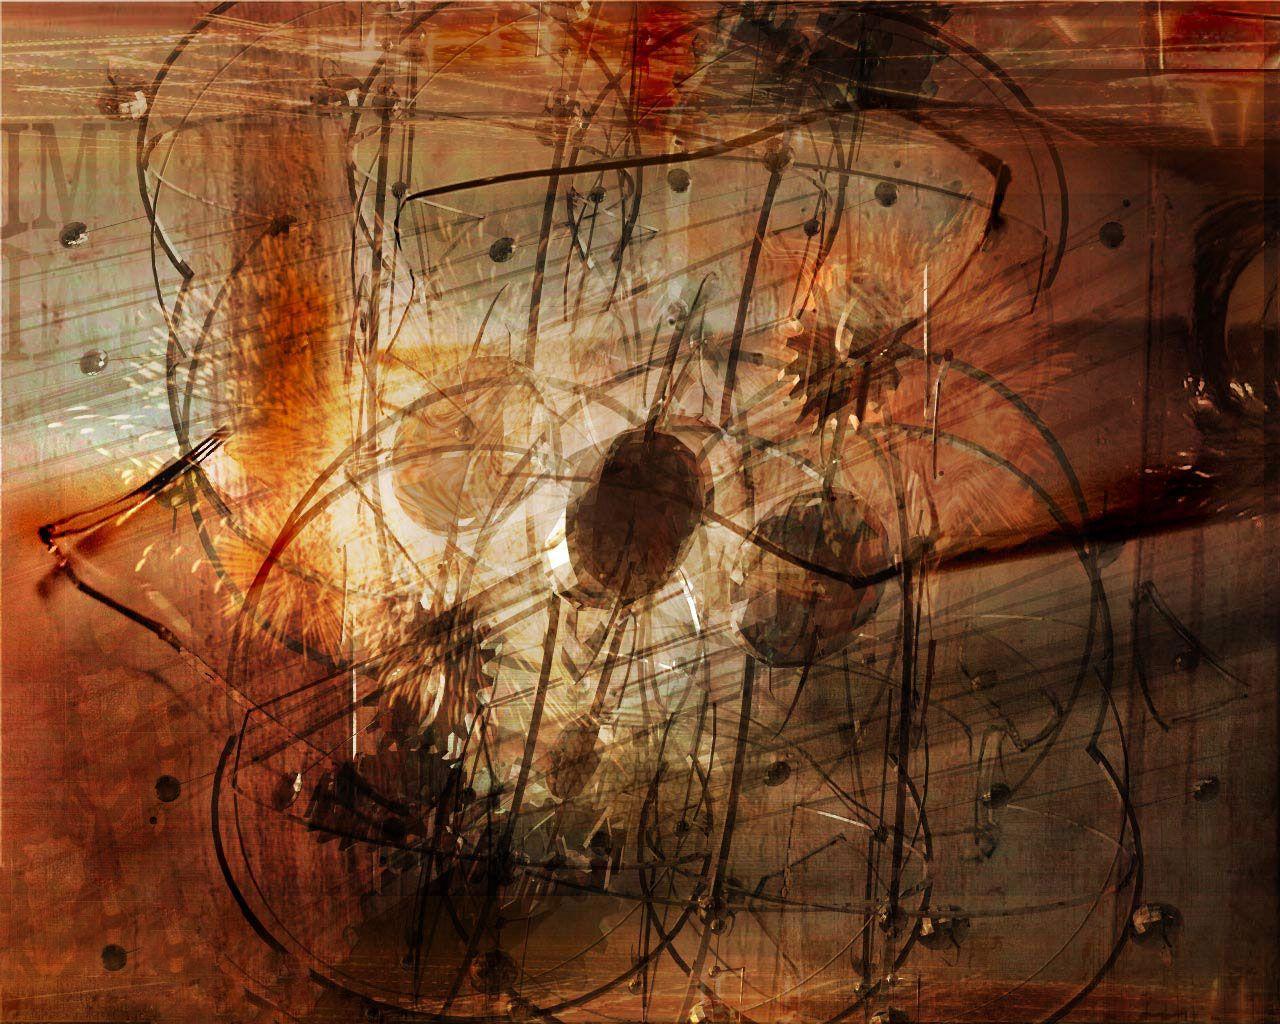 Chaos Art Images Hd Wallpaper Art Images High Quality Wallpapers Art